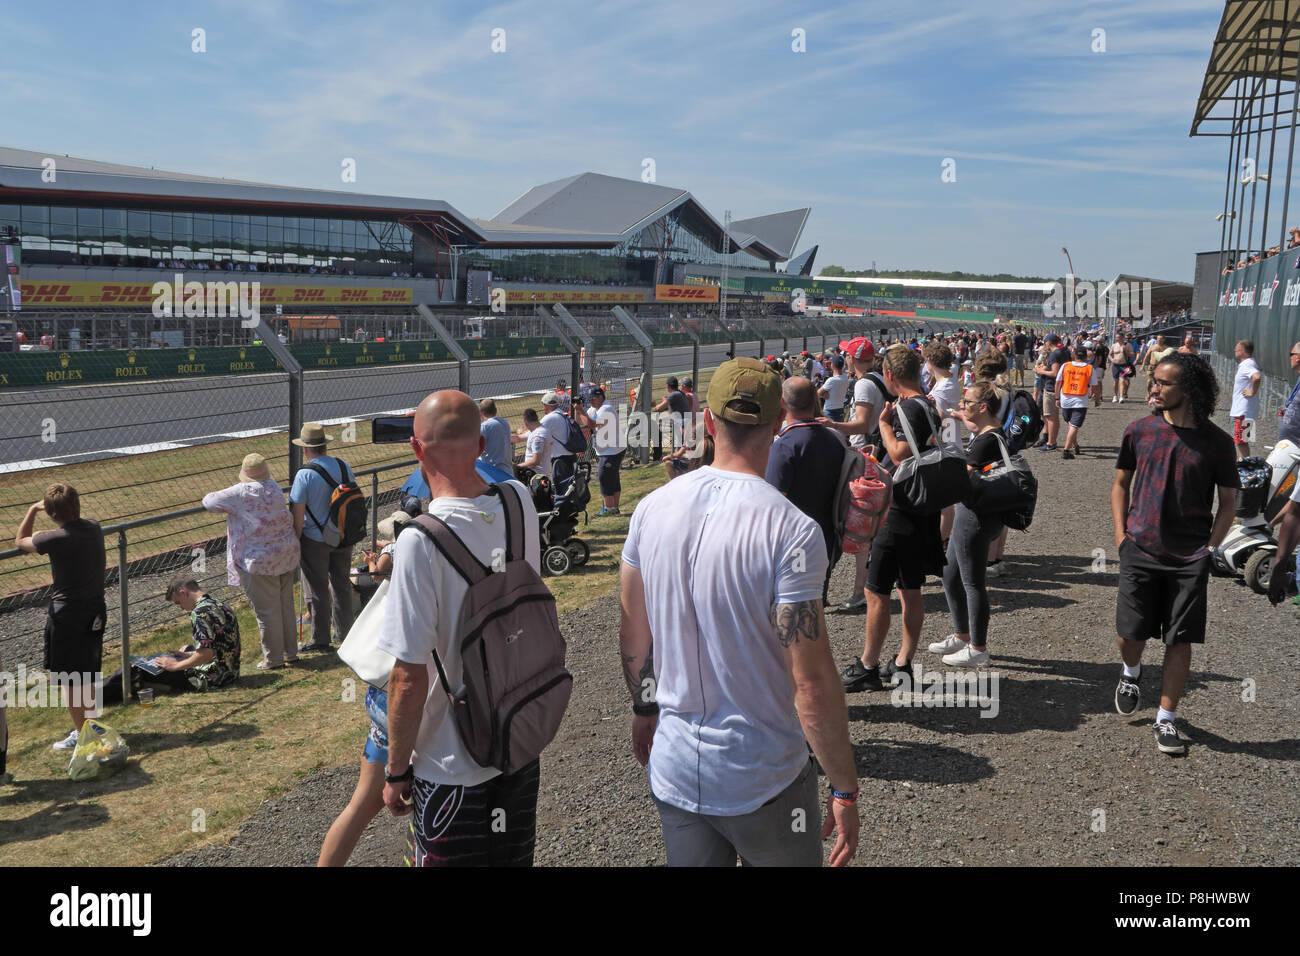 Silverstone Formula One Circuit and general admission spectators, Northamptonshire, West Midlands, England, UK Stock Photo